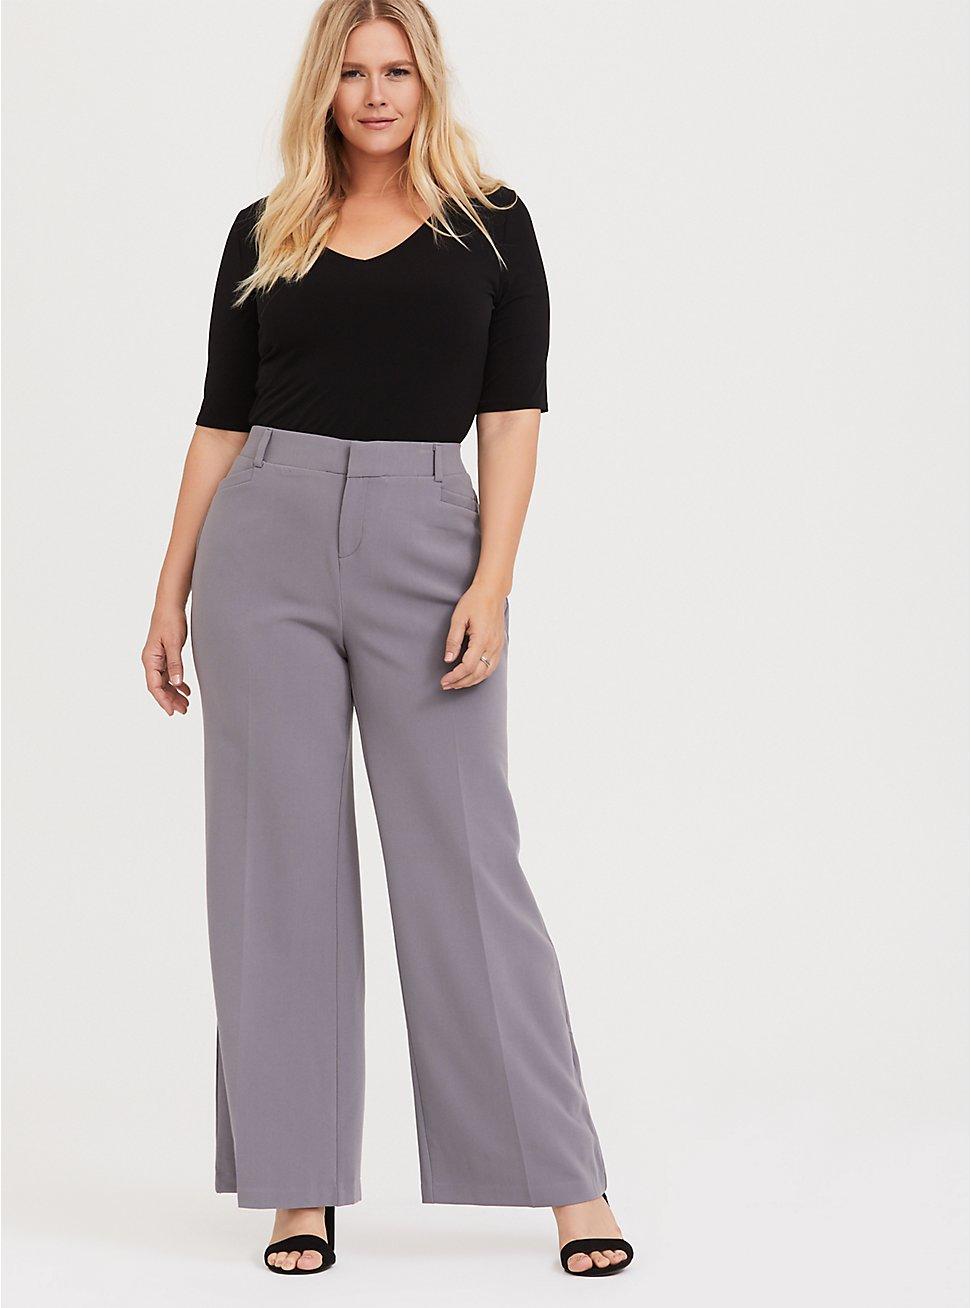 Slate Grey Structured Wide Leg Pant, DARK PEARL GREY, hi-res